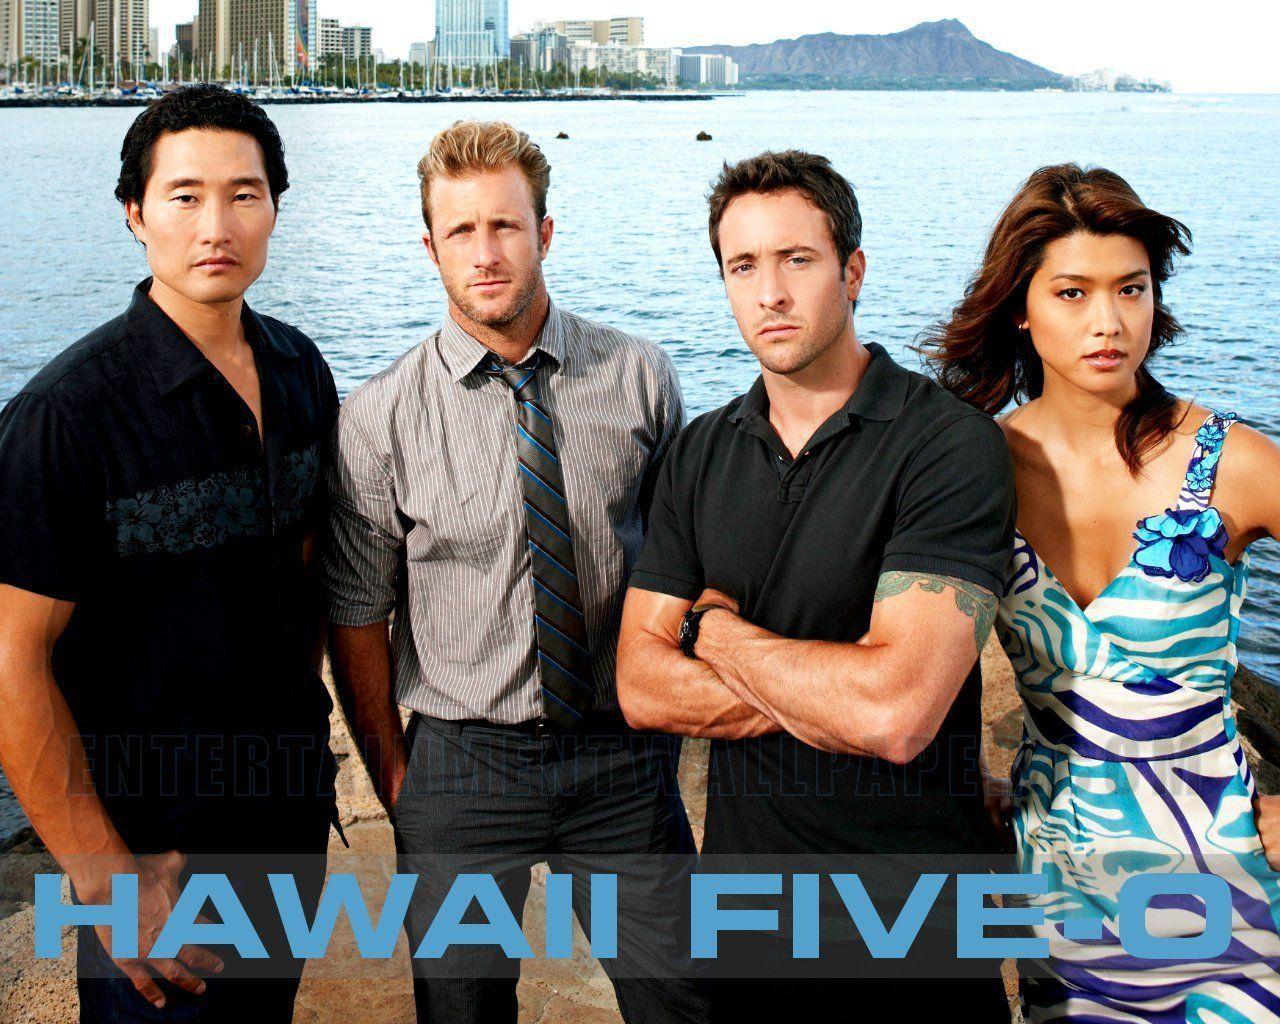 what happens watch hawaii five o season 6 episode 3 you keep